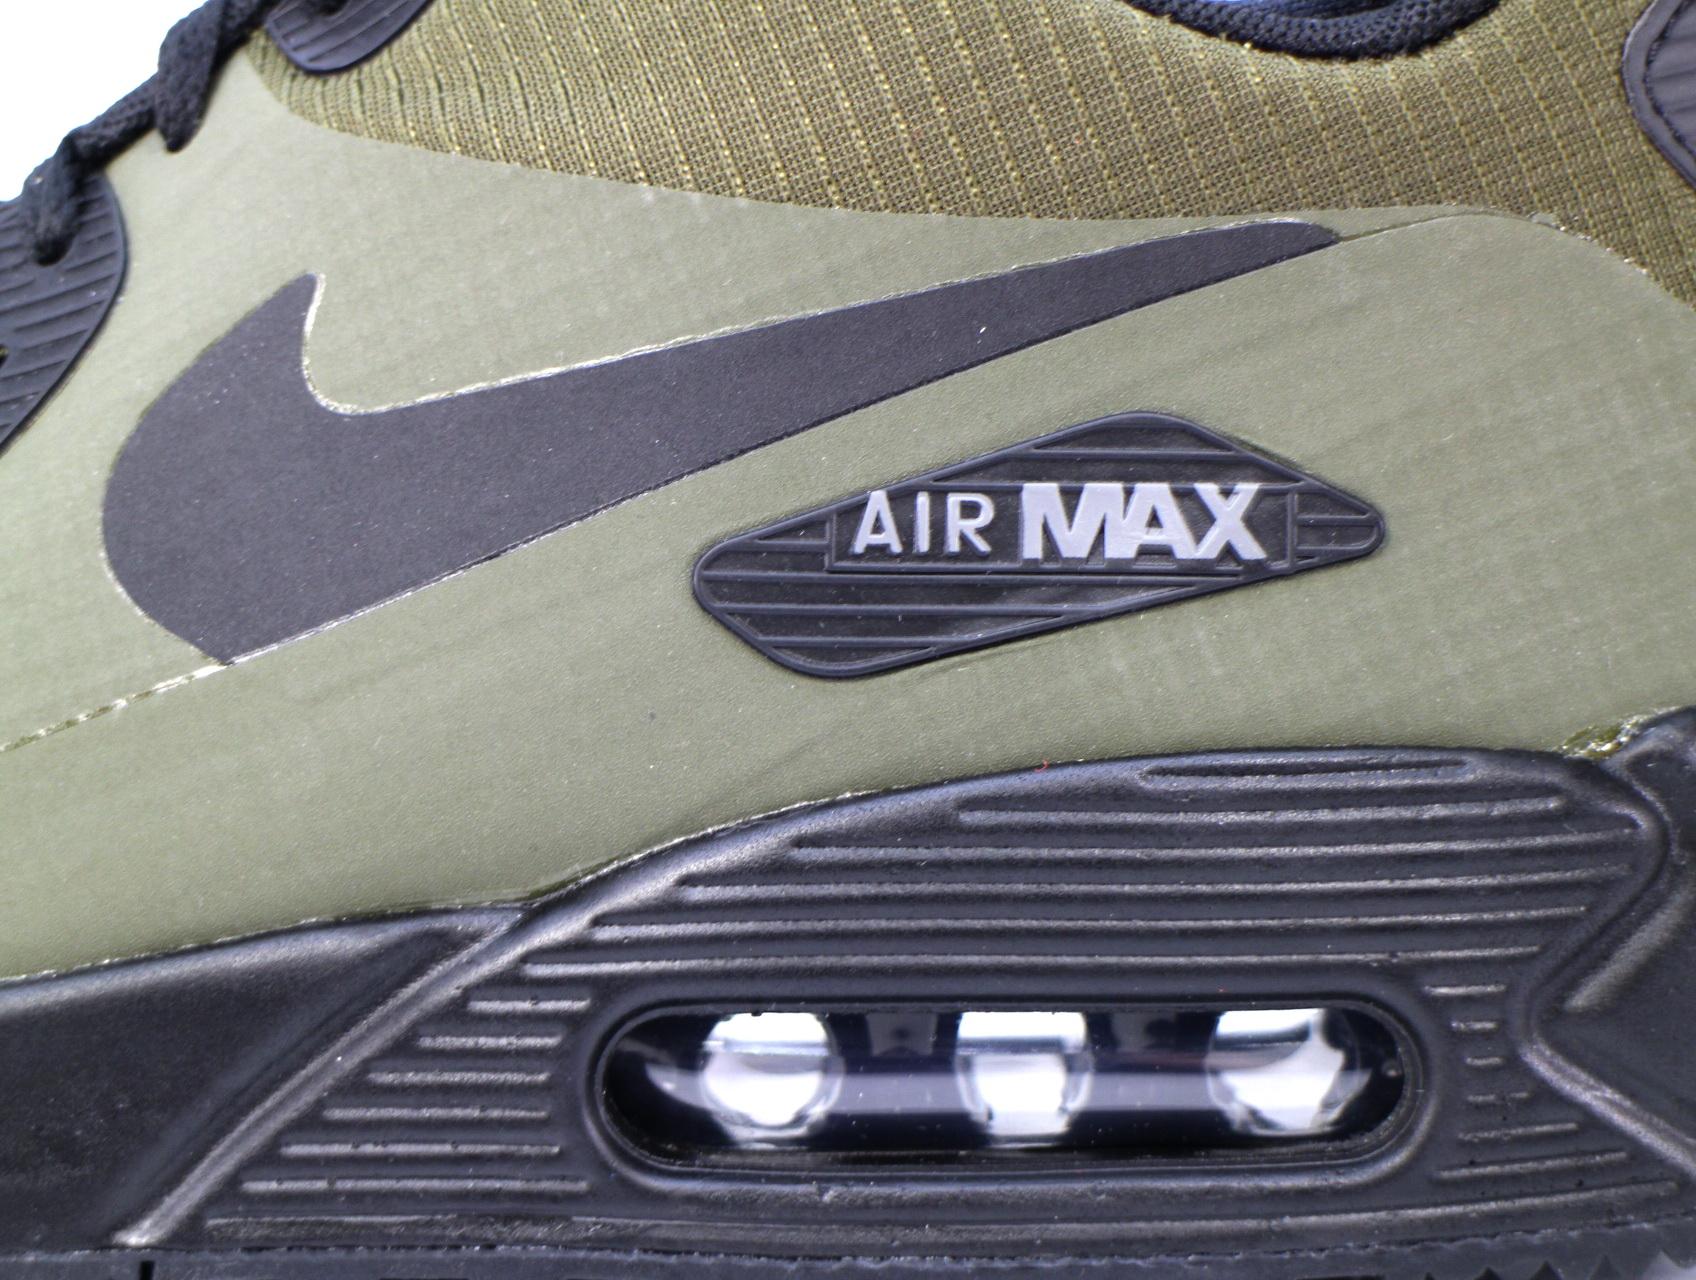 AIR MAX 90 MID WNTRの商品画像-6